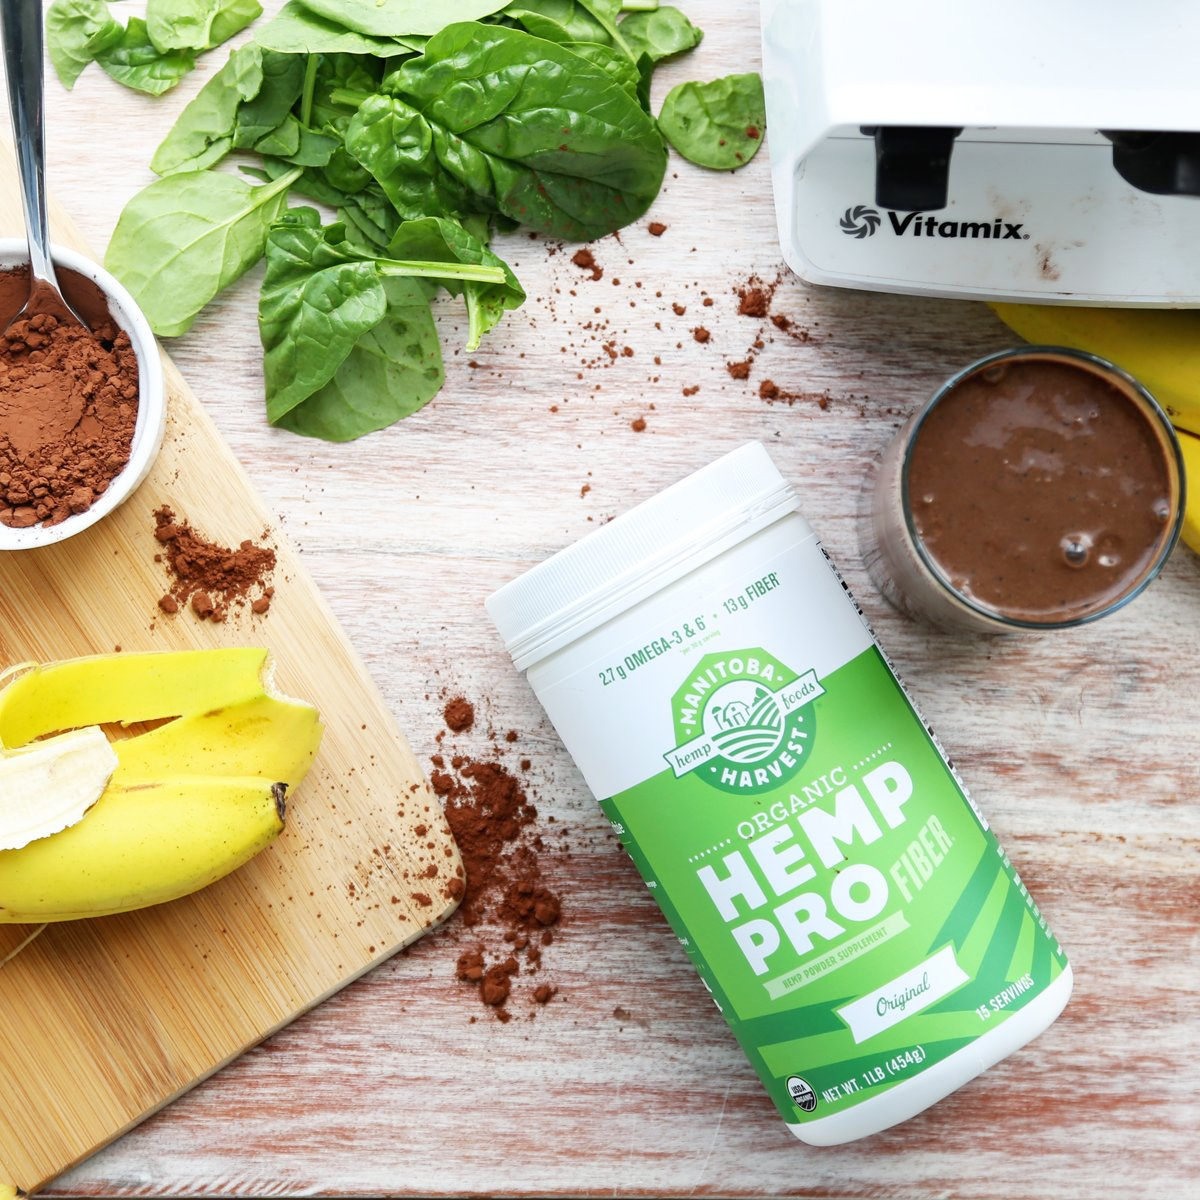 Manitoba Harvest Organic Hemp Pro Fiber plus Protein Supplement, 32 Ounce; 13 grams of fiber per serving